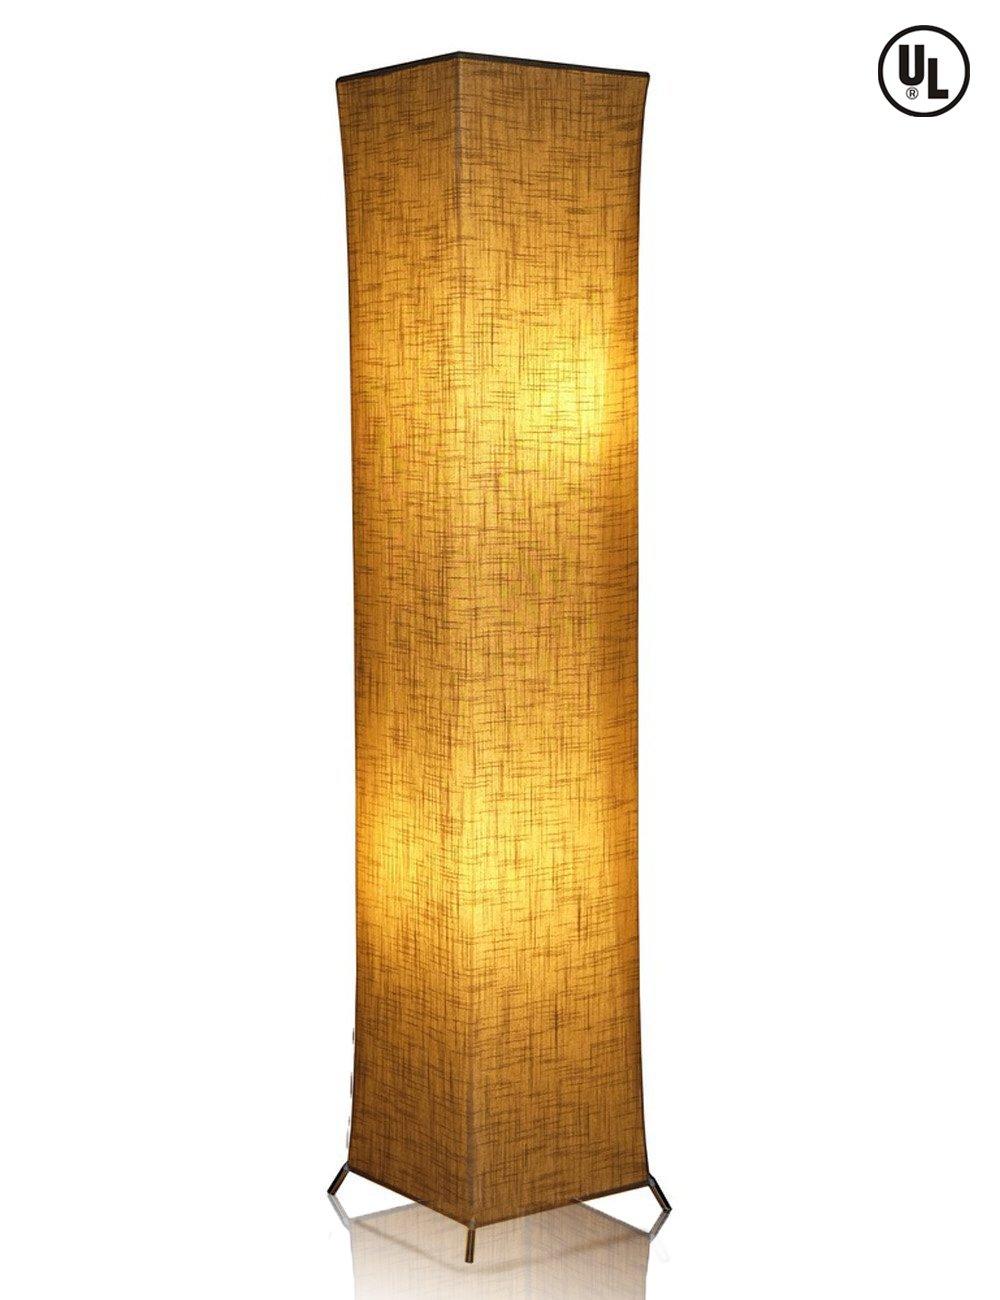 LEONC 52'' Creative Floor Lamp Softlighting Home Design Minimalist Modern Floor Lamp with Fabric Shade & 2 Bulbs for Bedroom Living room Warm Atmosphere (Size Linen Fabric: 10 x 10 x 52 inch)